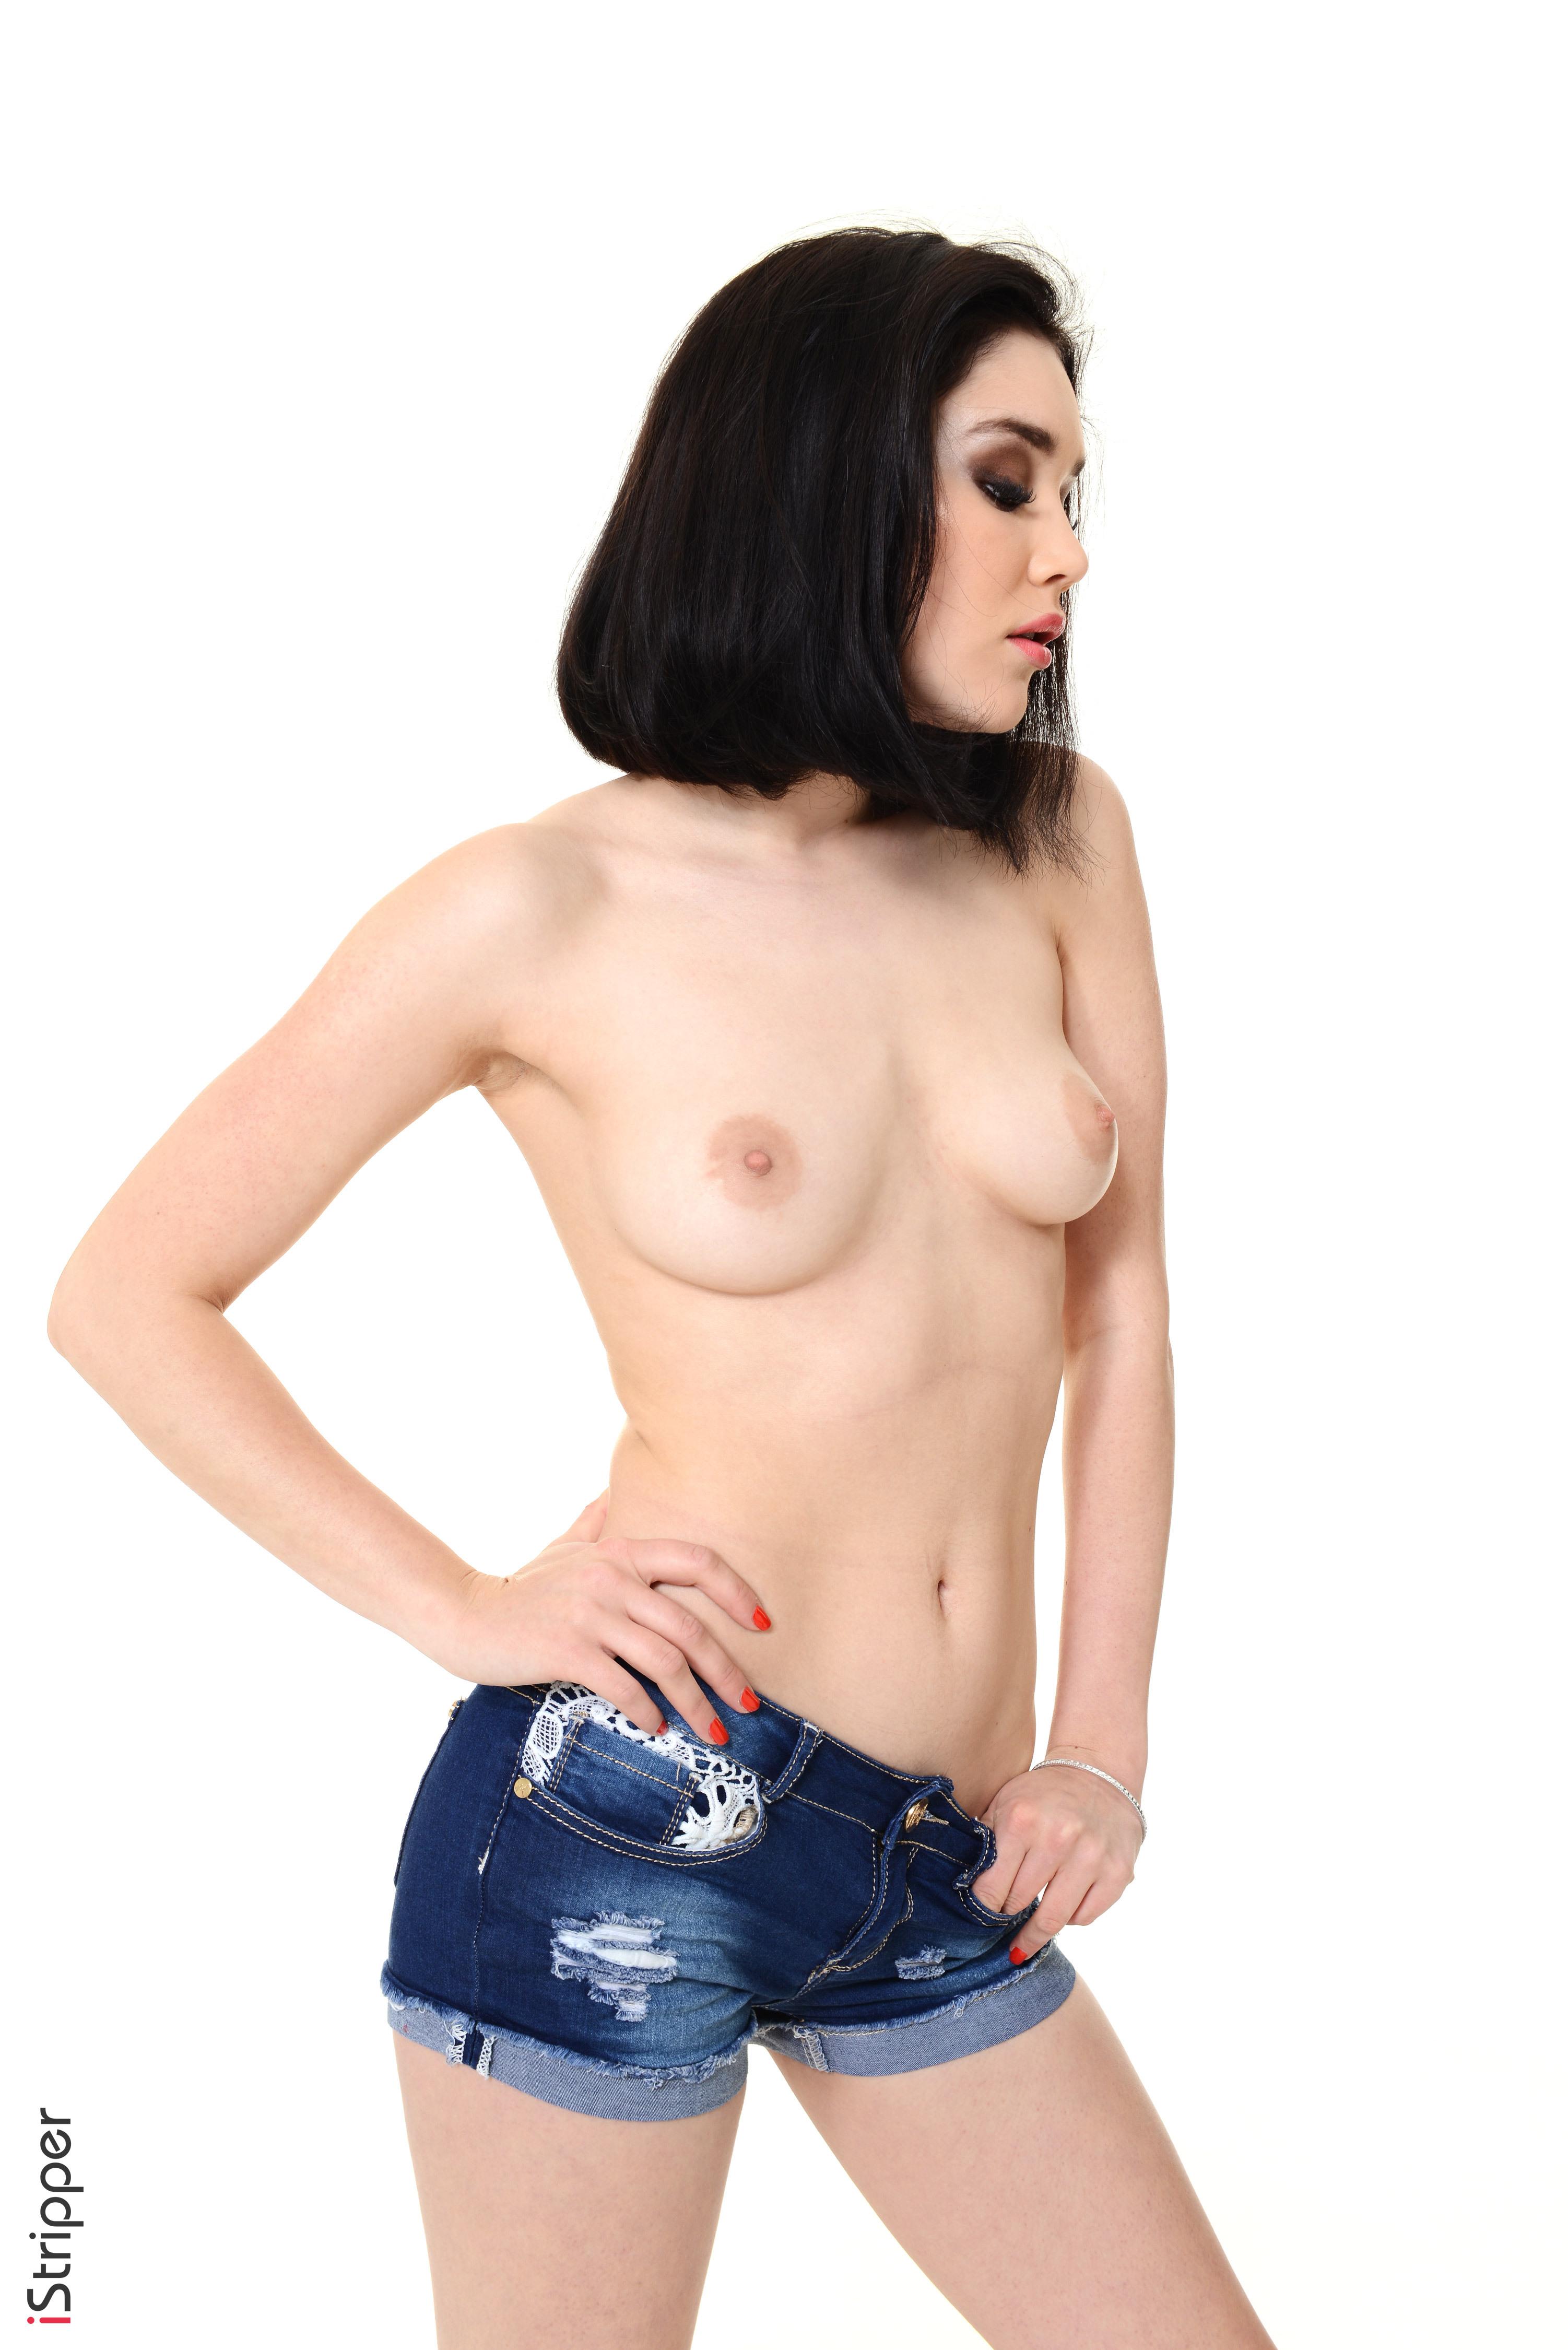 free erotic nude women